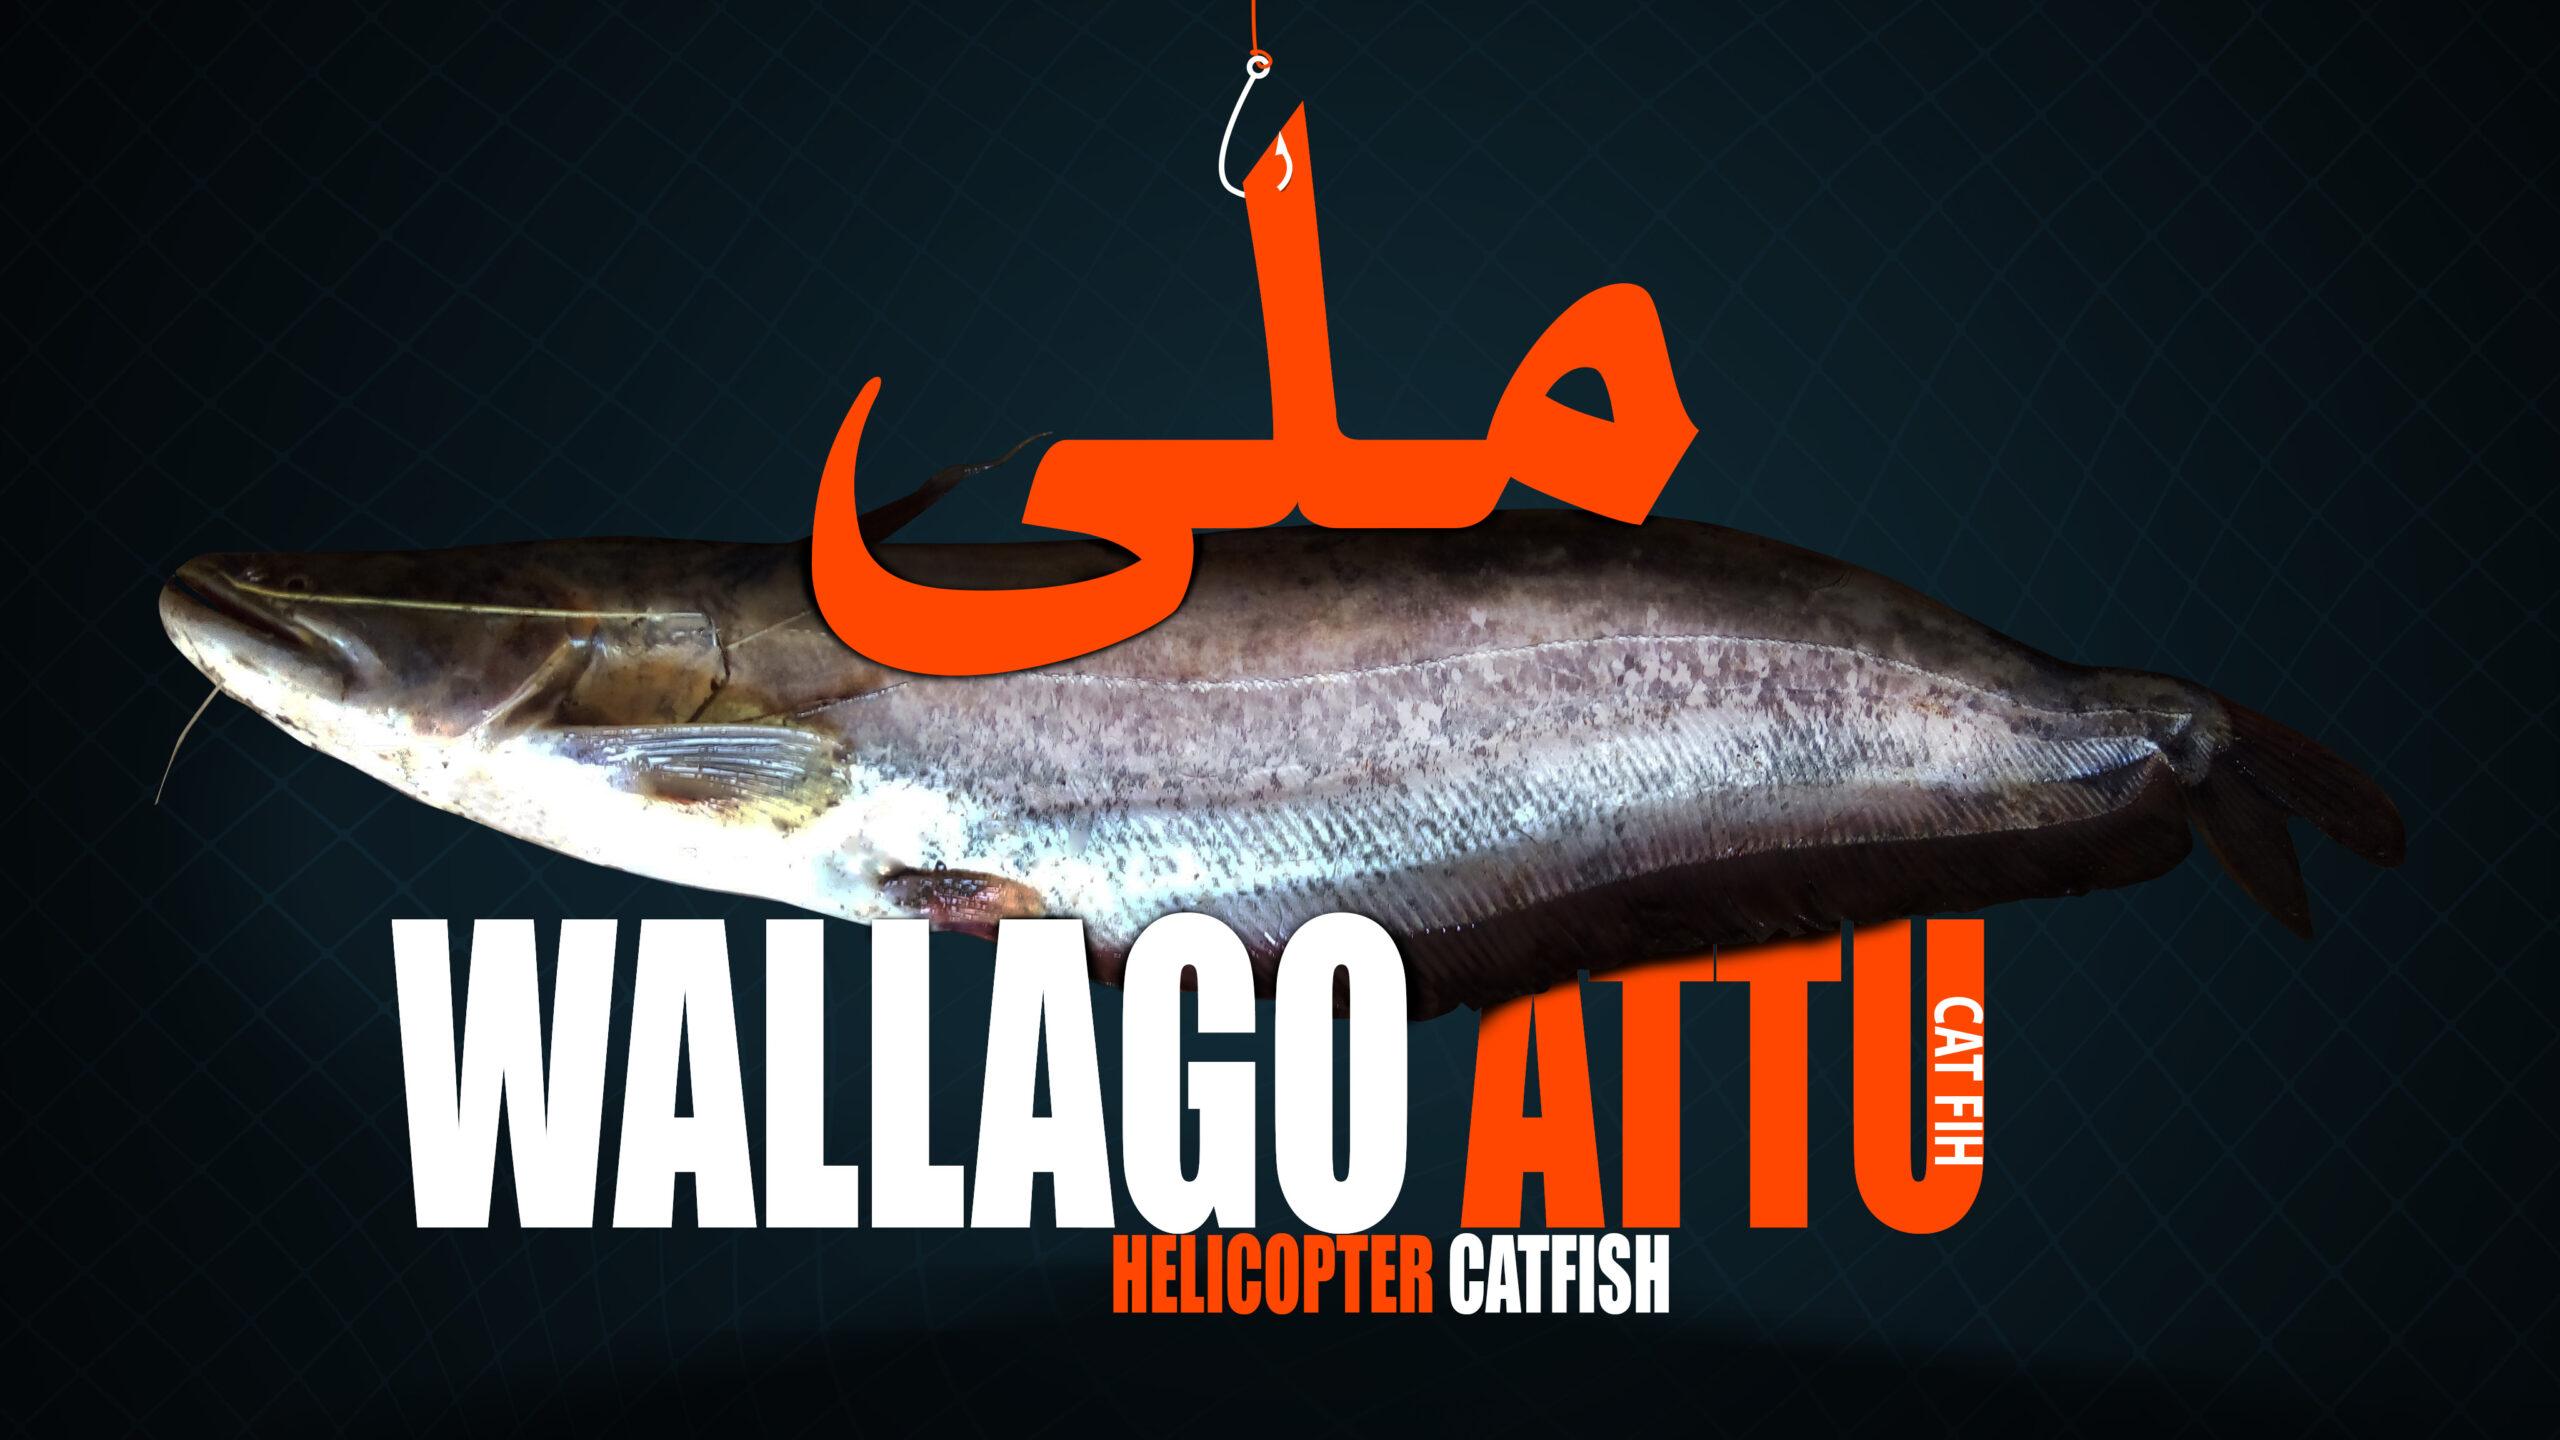 Wallago Attu Cat Fish helicopter fish